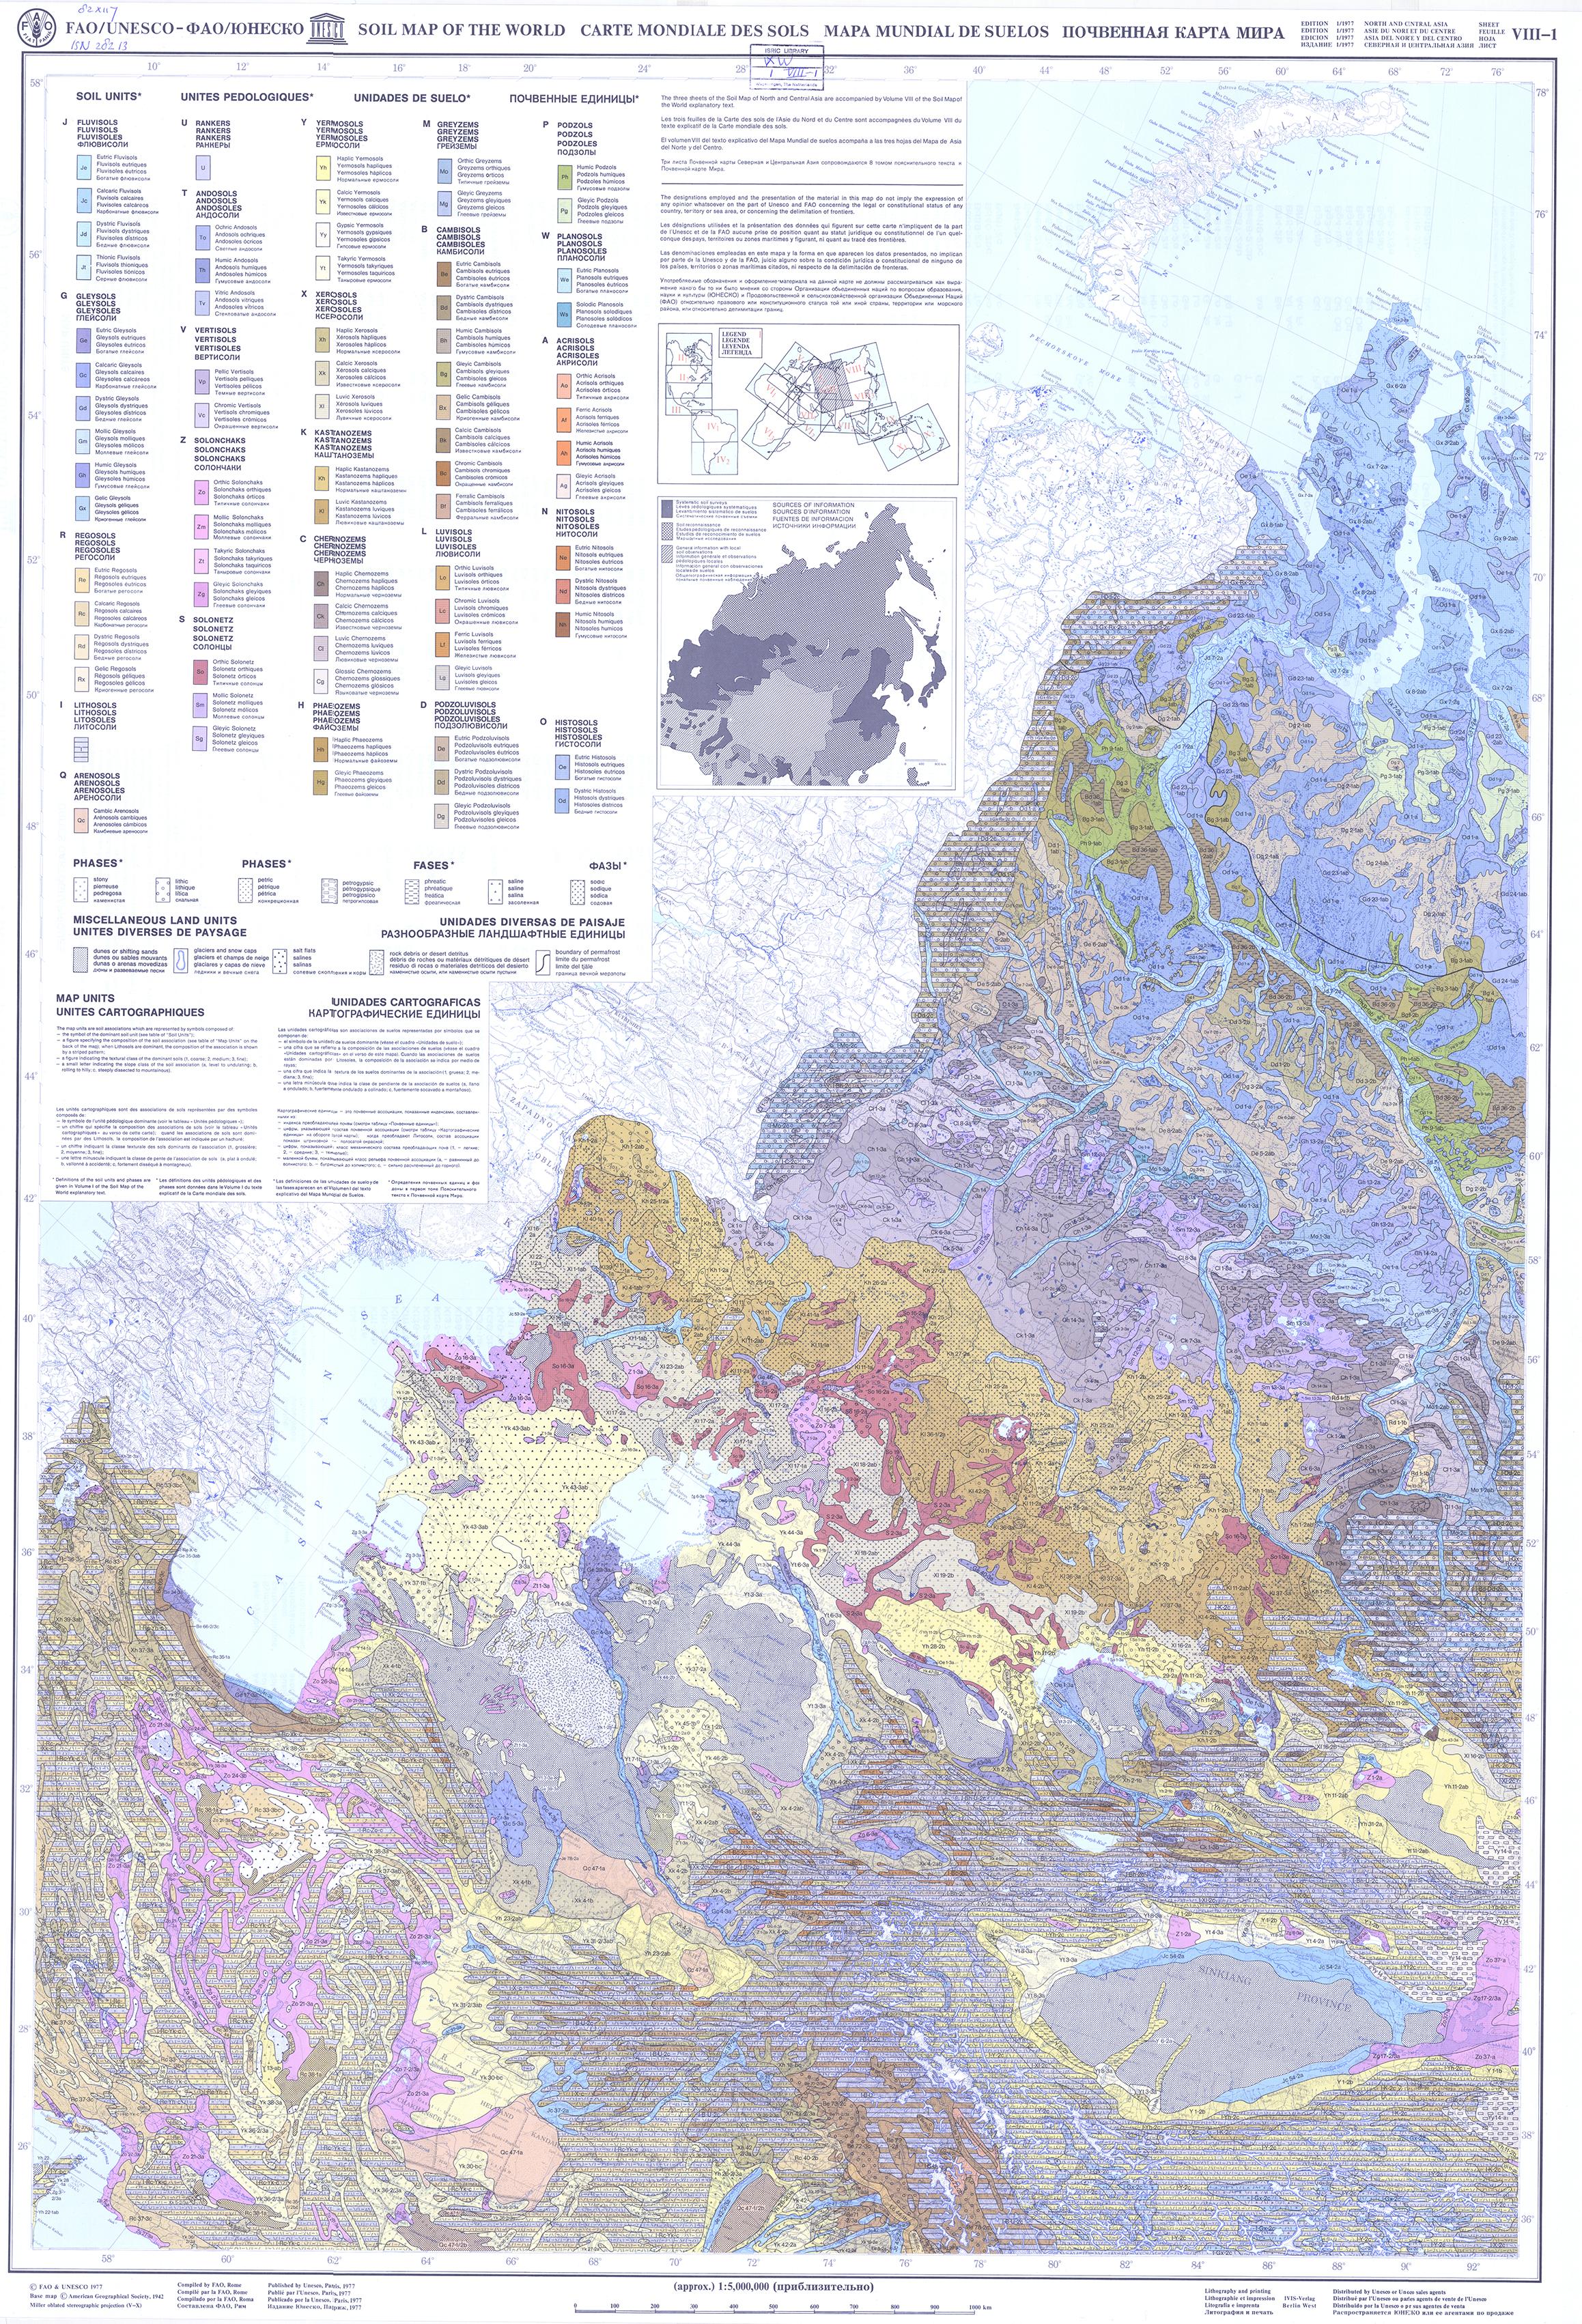 Faounesco soil map of the world fao soils portal food and map 1 gumiabroncs Choice Image